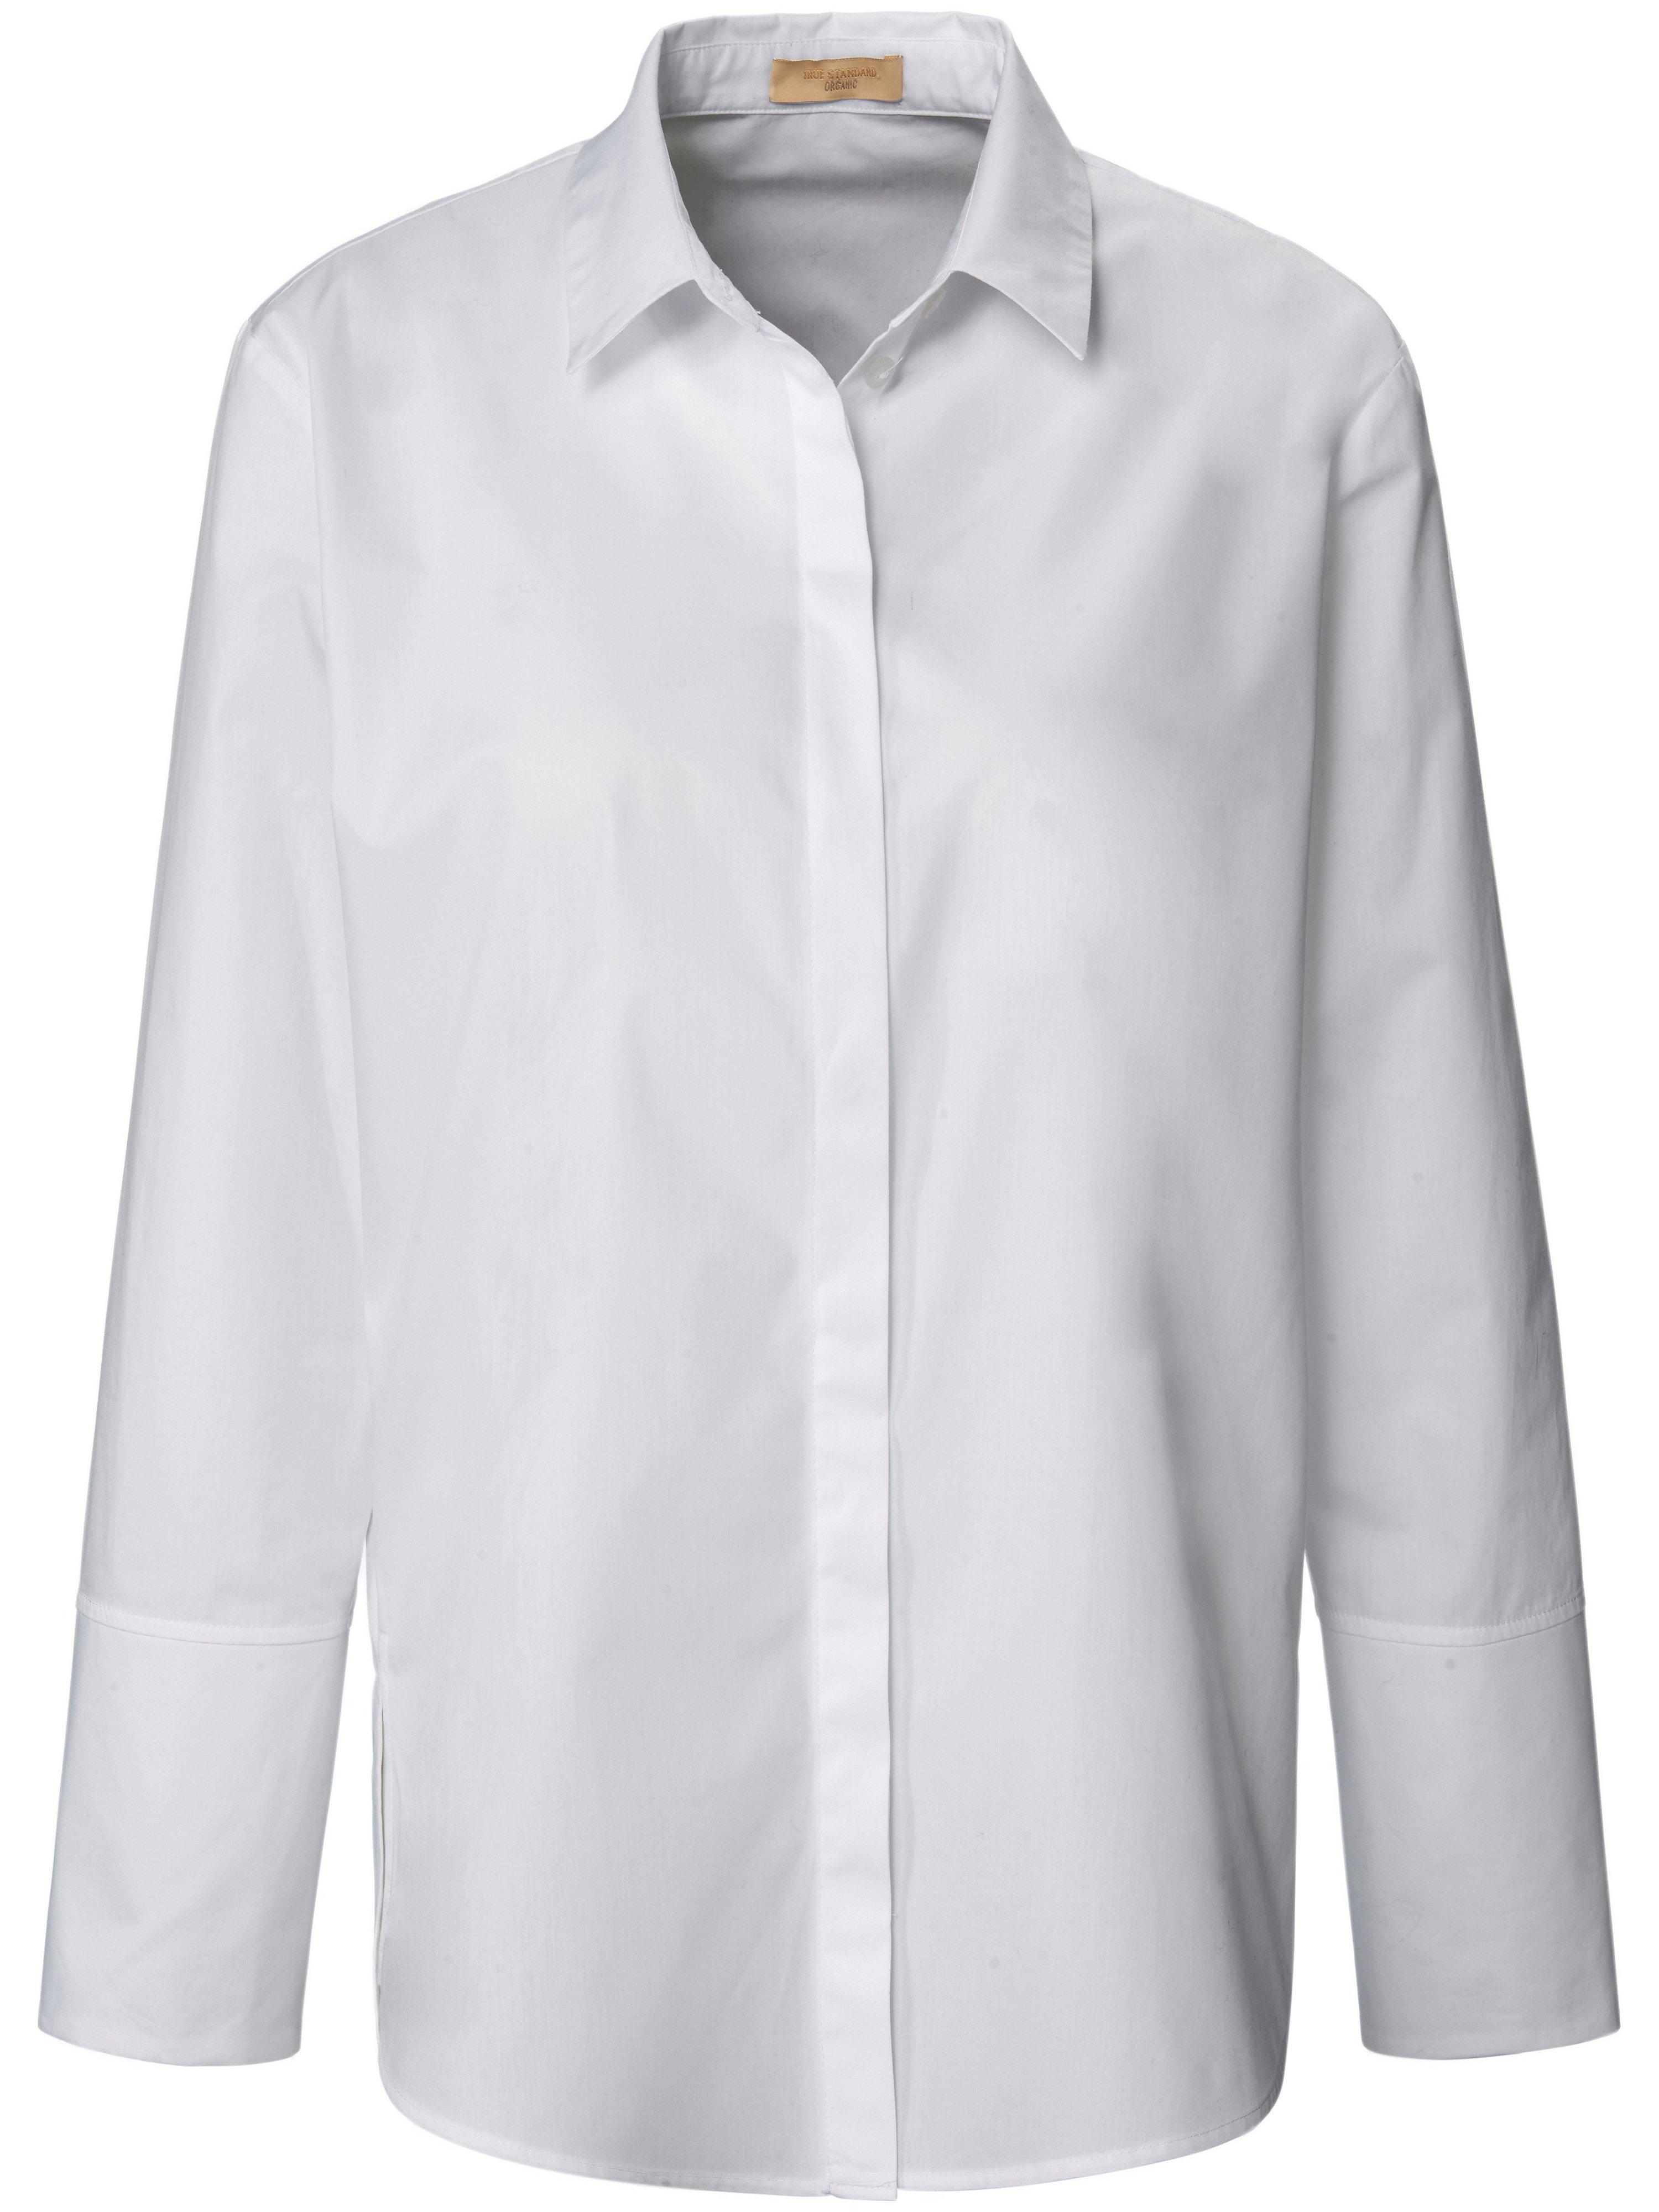 Lange blouse 100% katoen lange mouwen Van tRUE STANDARD wit